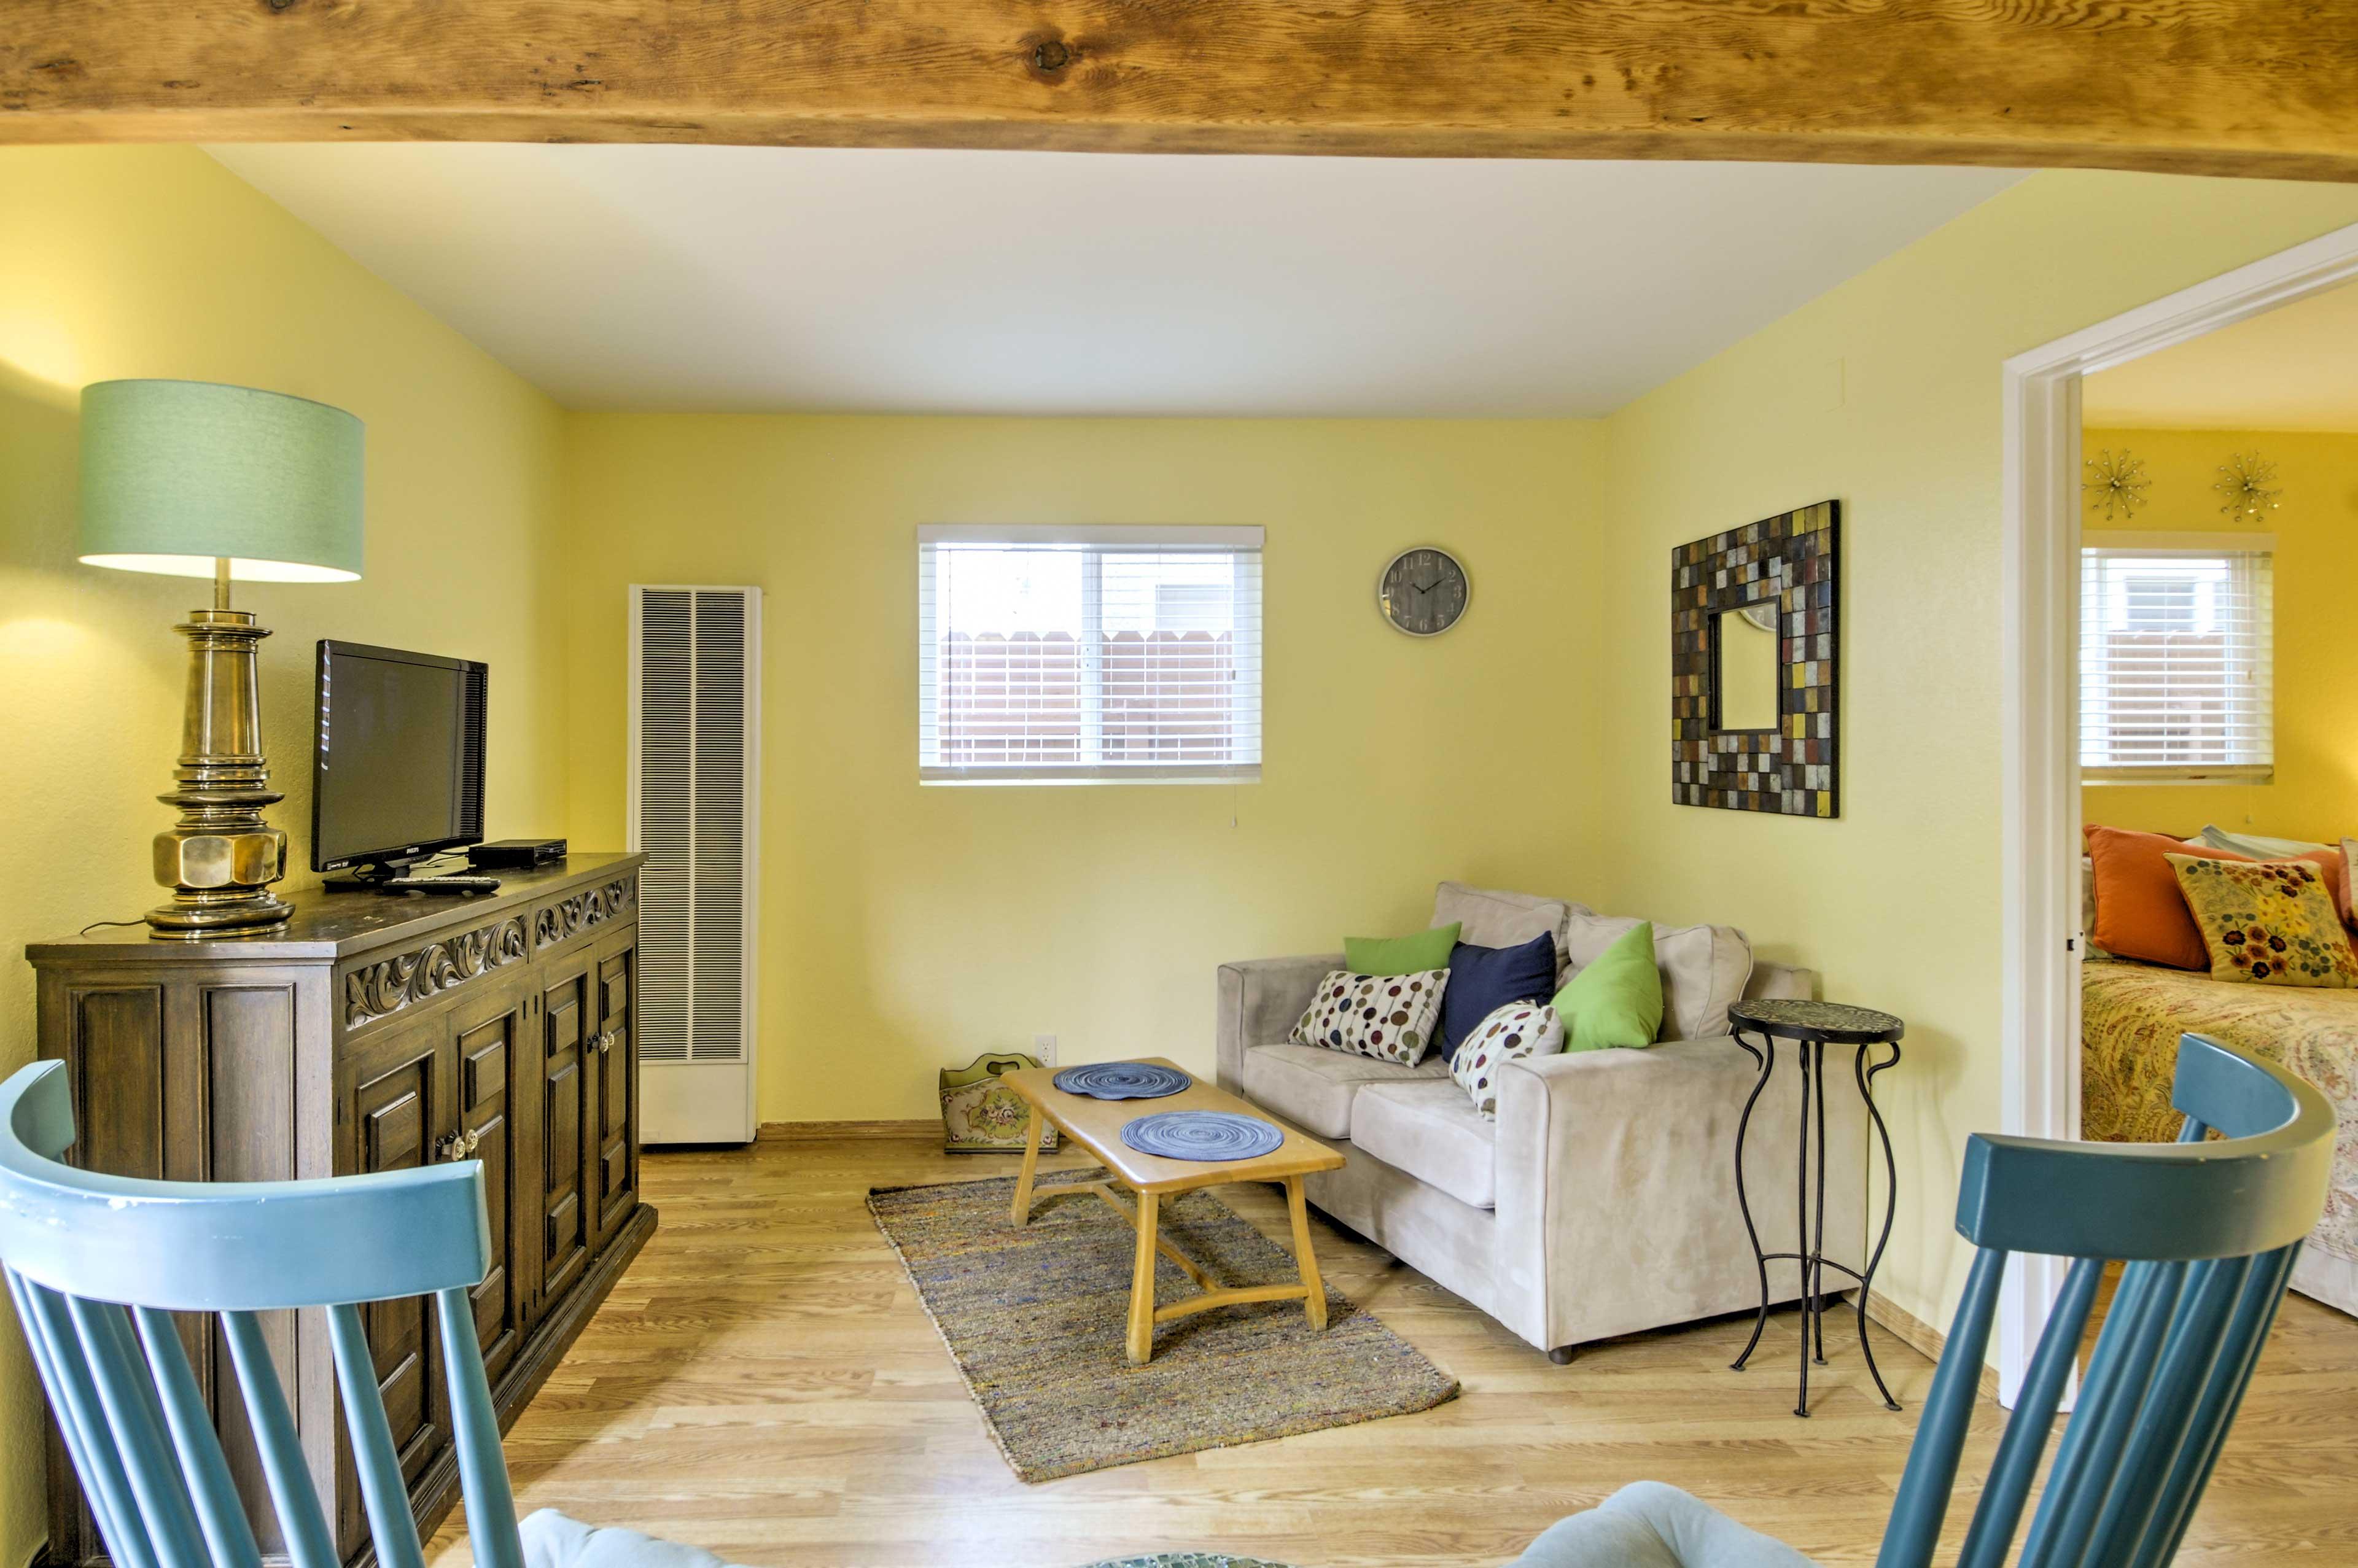 A seaside oasis awaits at this cozy 1-bedroom, 1-bathroom Oxnard vacation rental